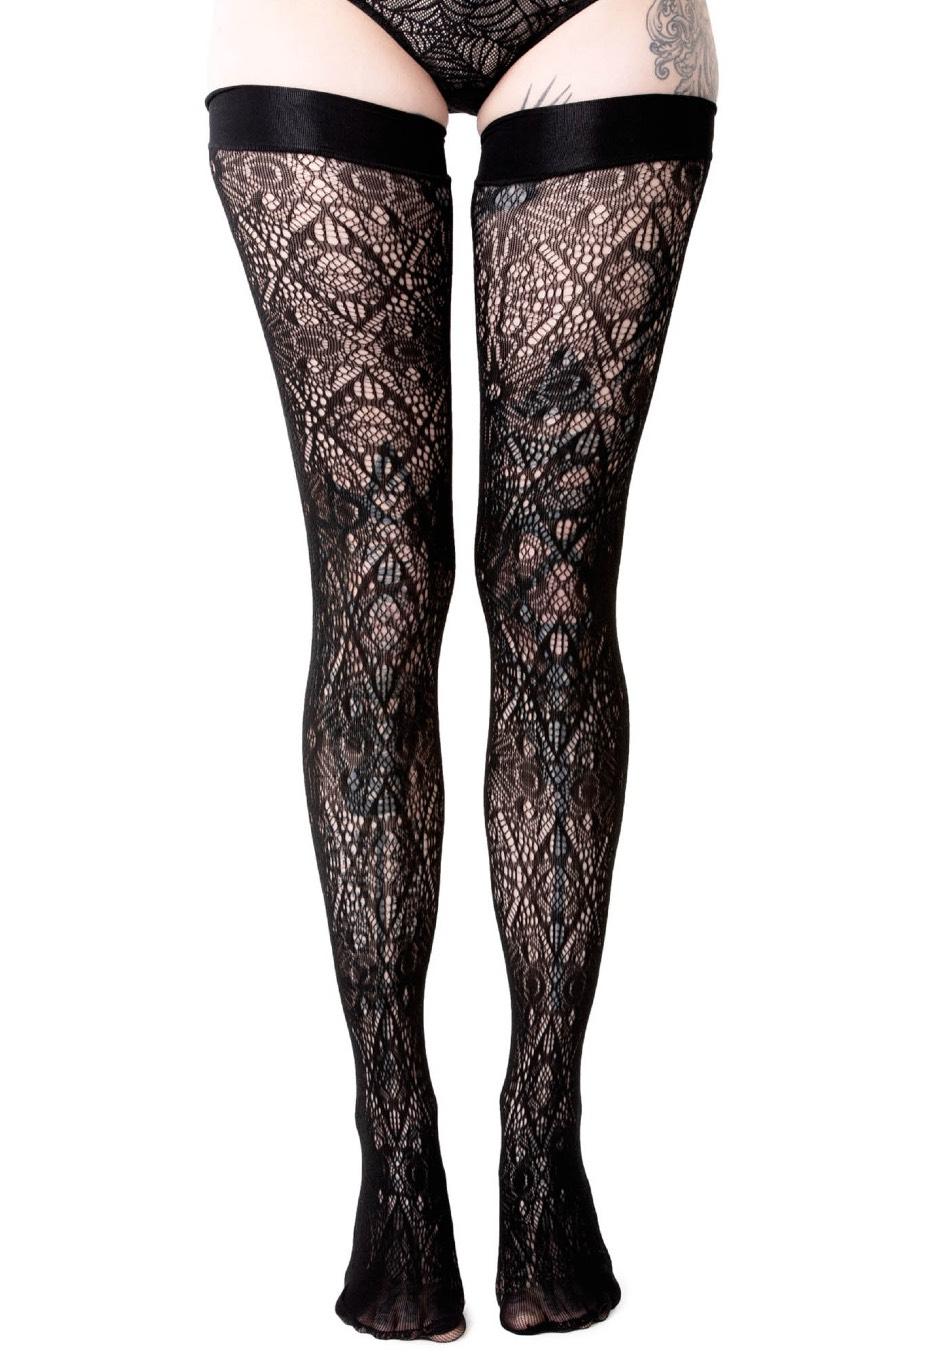 killstar wolfsbane stocking black socks streetwear shop